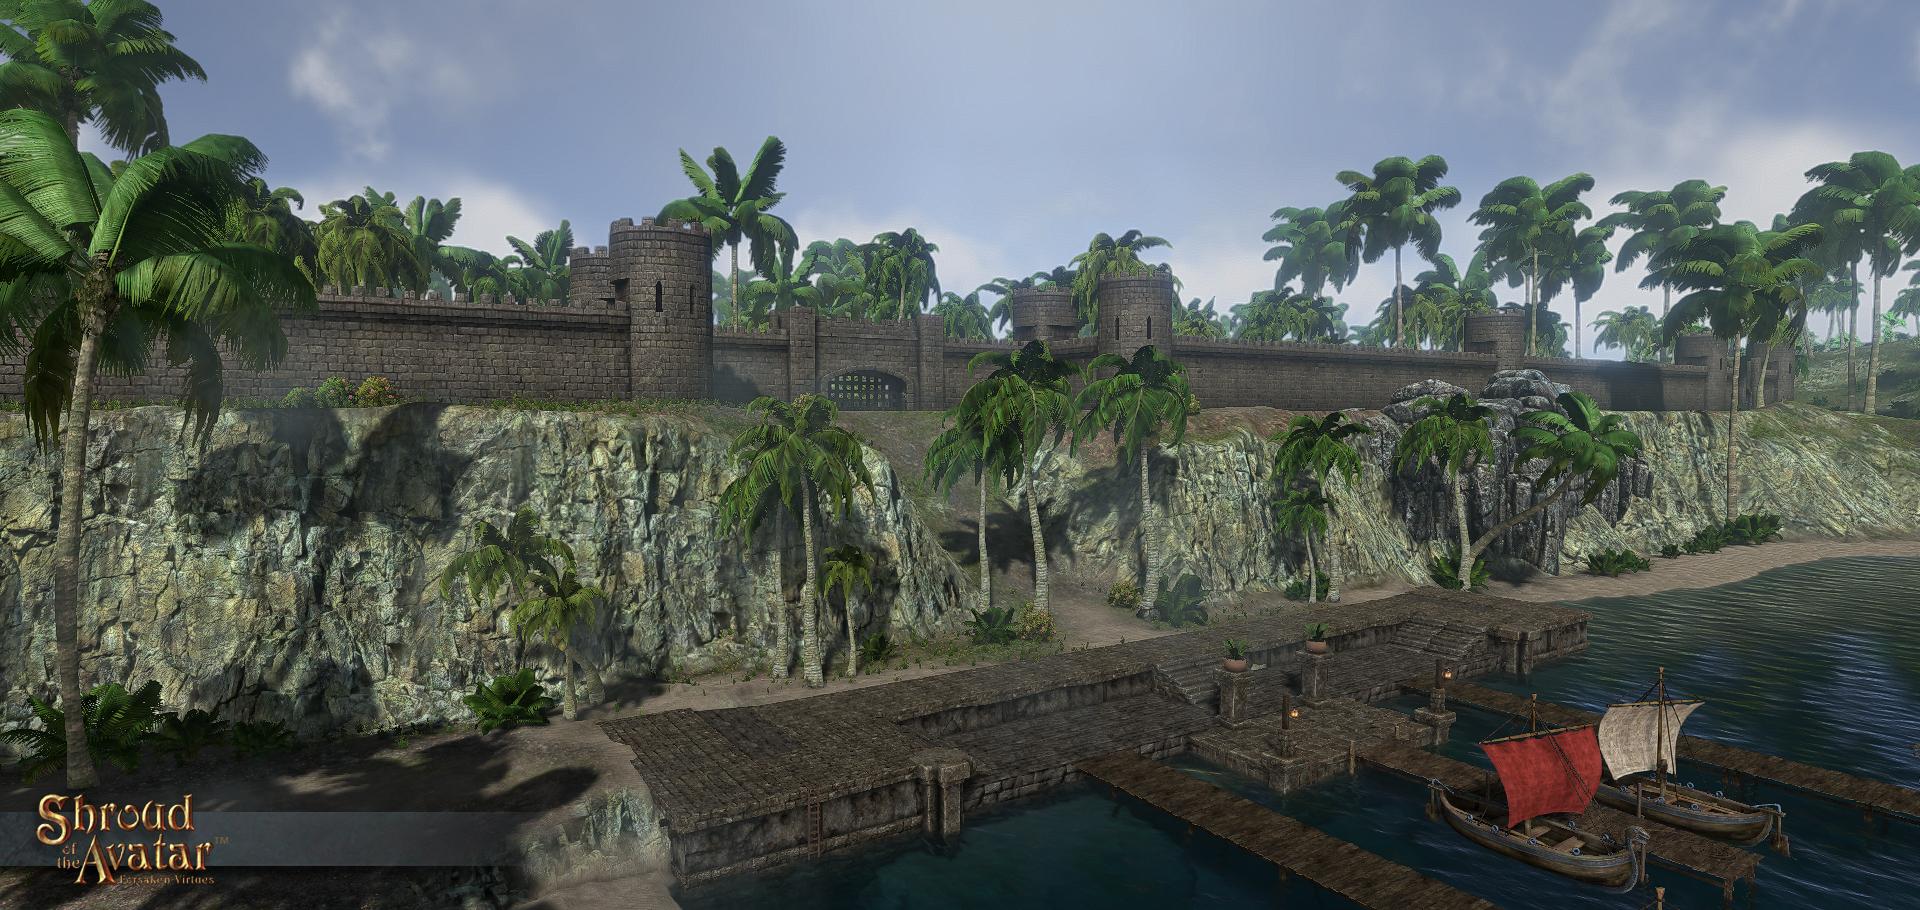 tropicalisland_1a_01